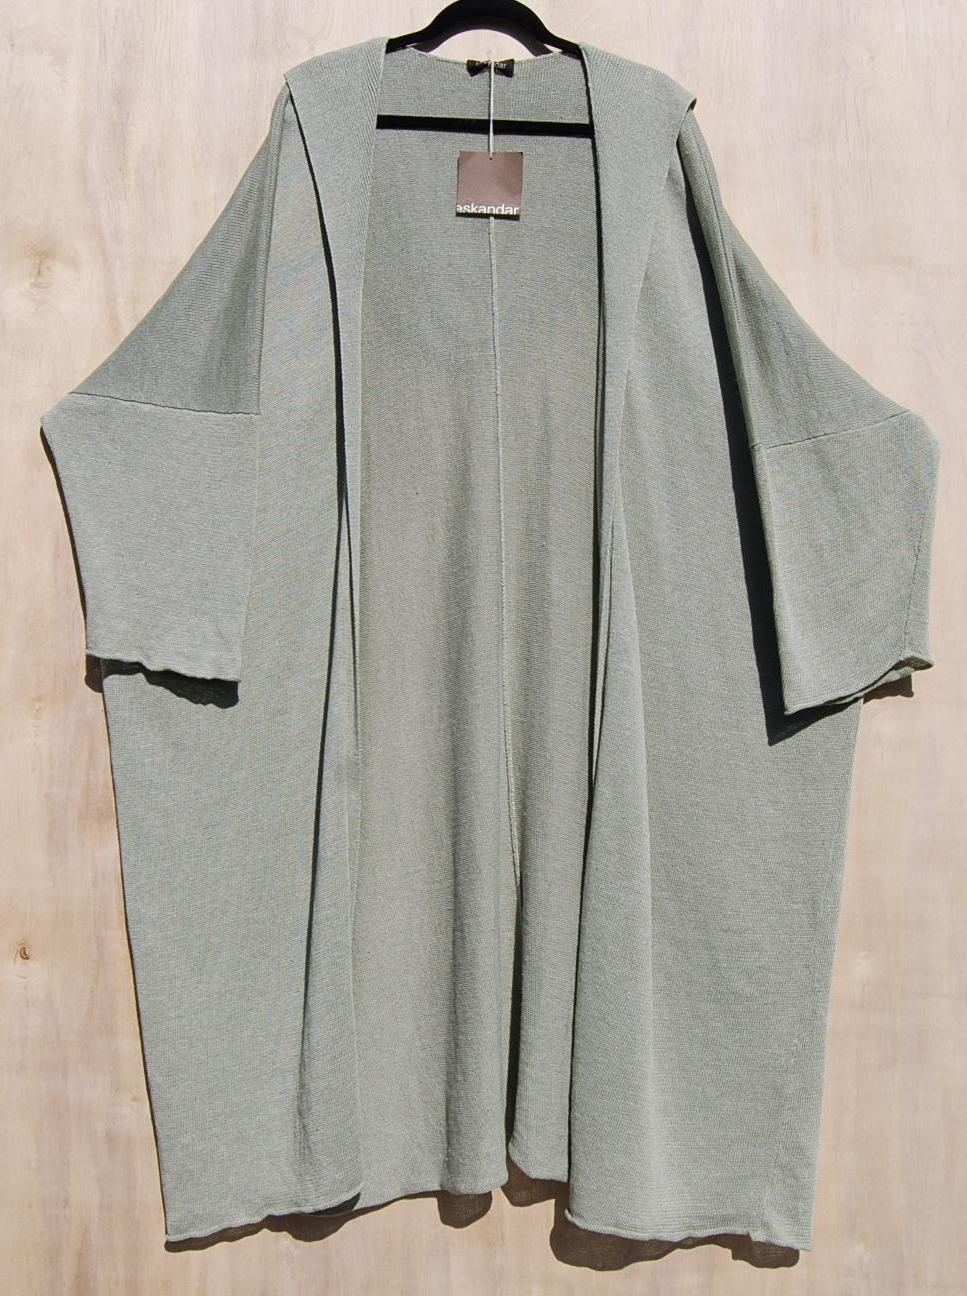 NWT Eskandar SAGE Light Weight Linen Knit Hooded 46  Long Cardigan O S